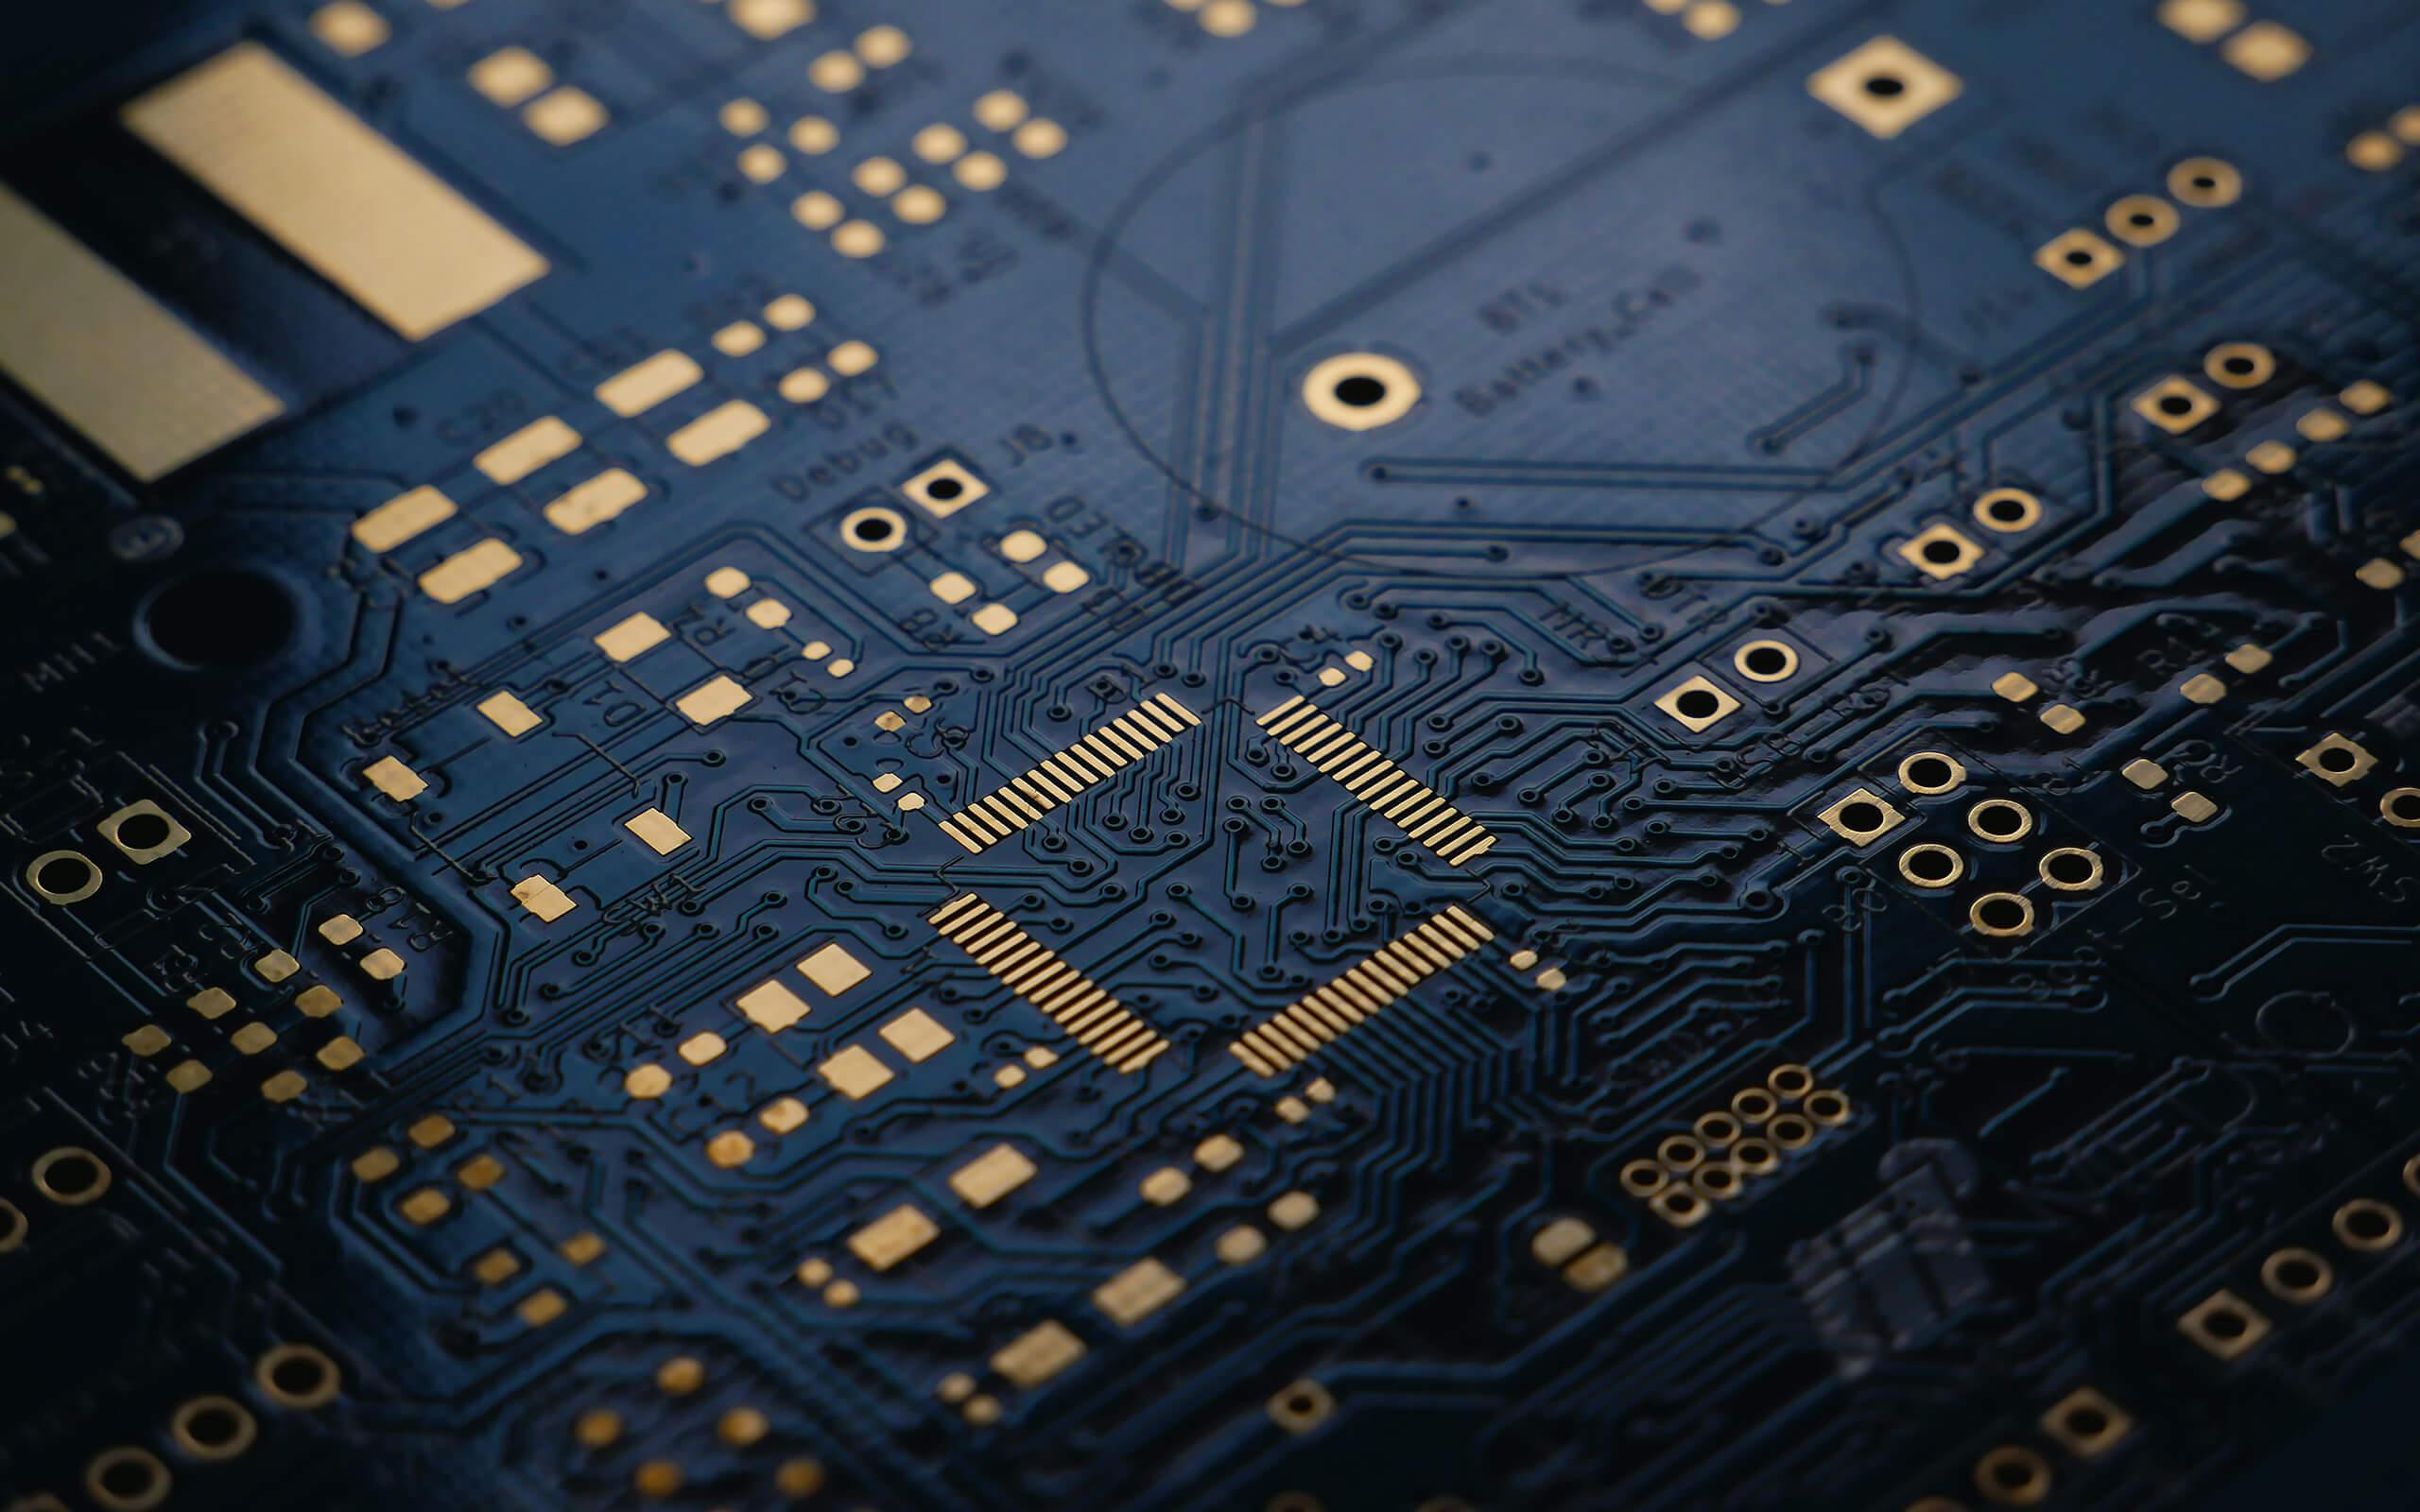 Close up of a microchip board